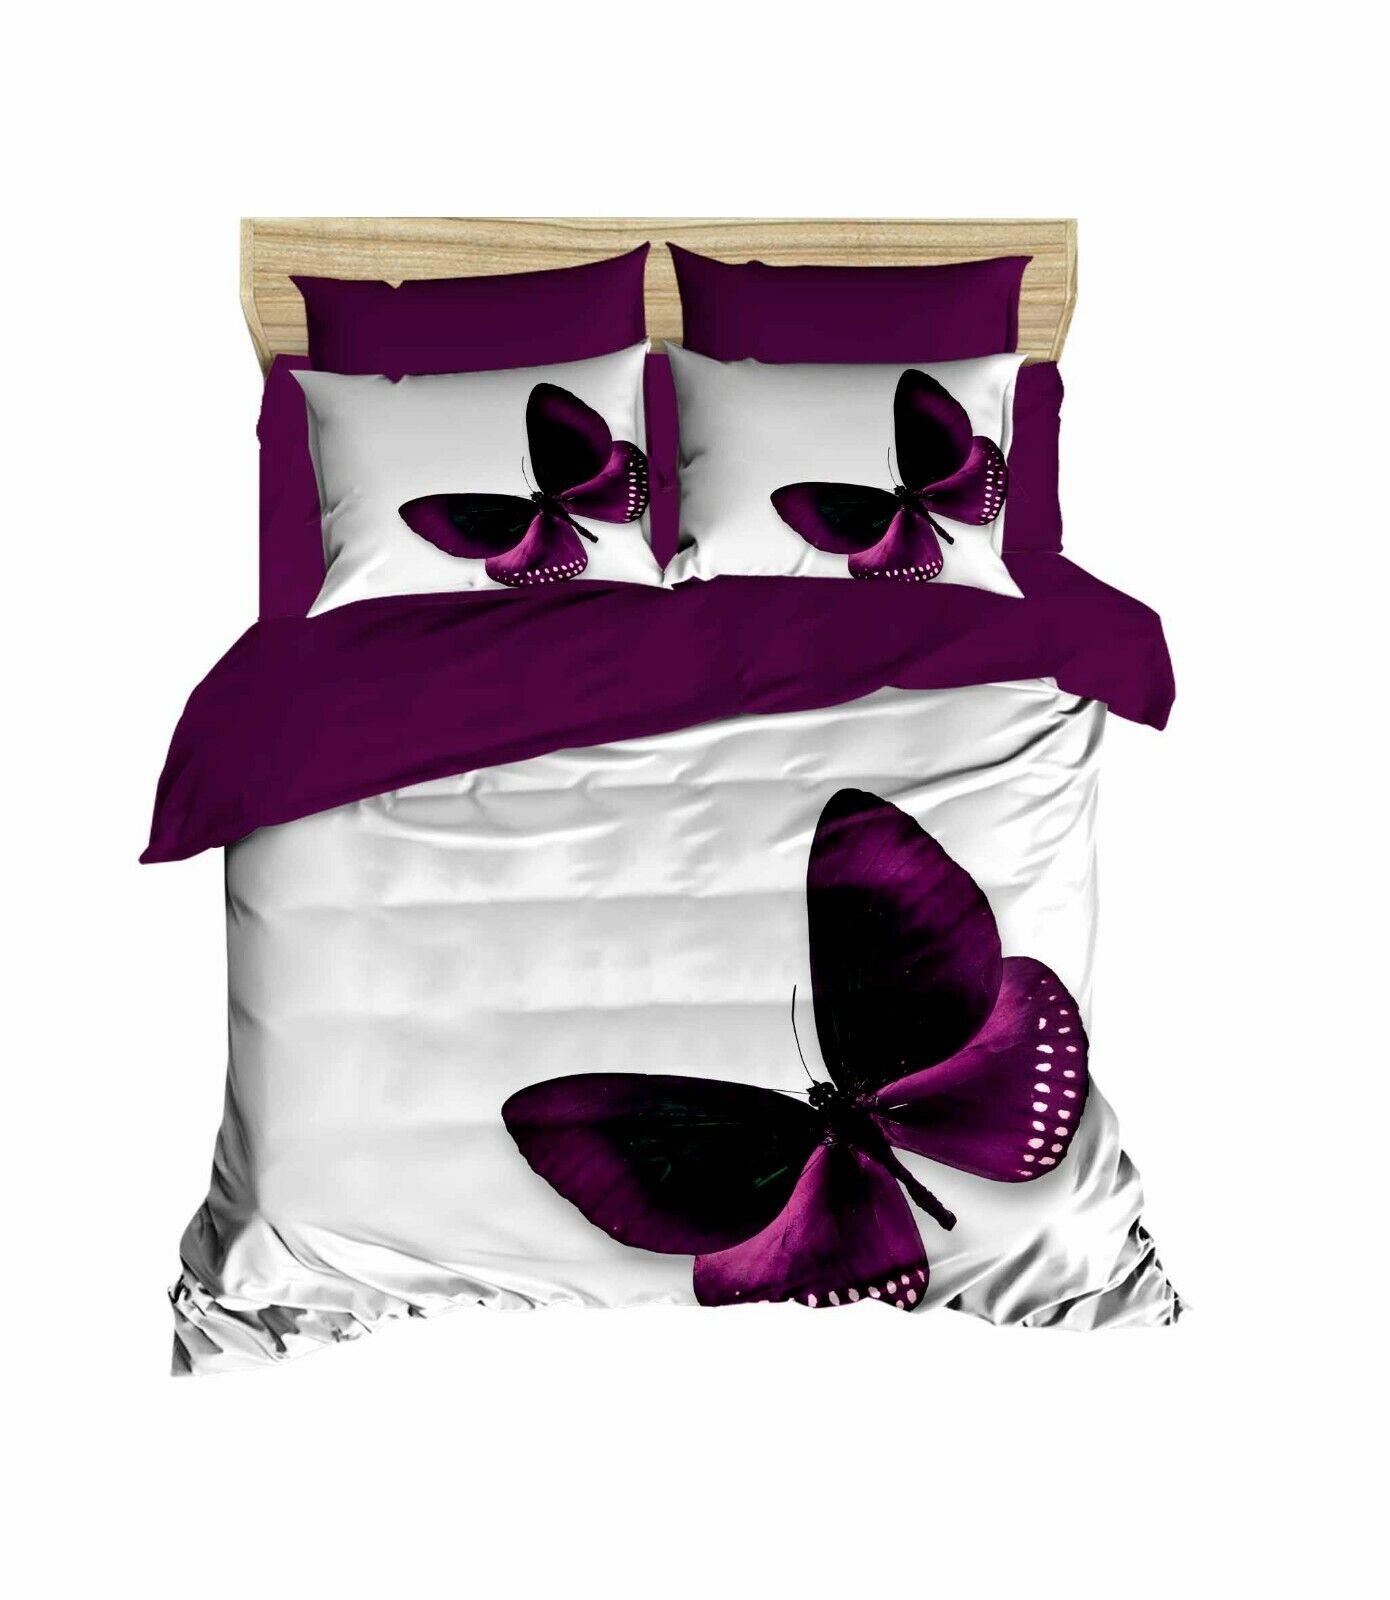 Butterfly Bedding 3D Printed 100% Duvet Cover Set Full/Queen